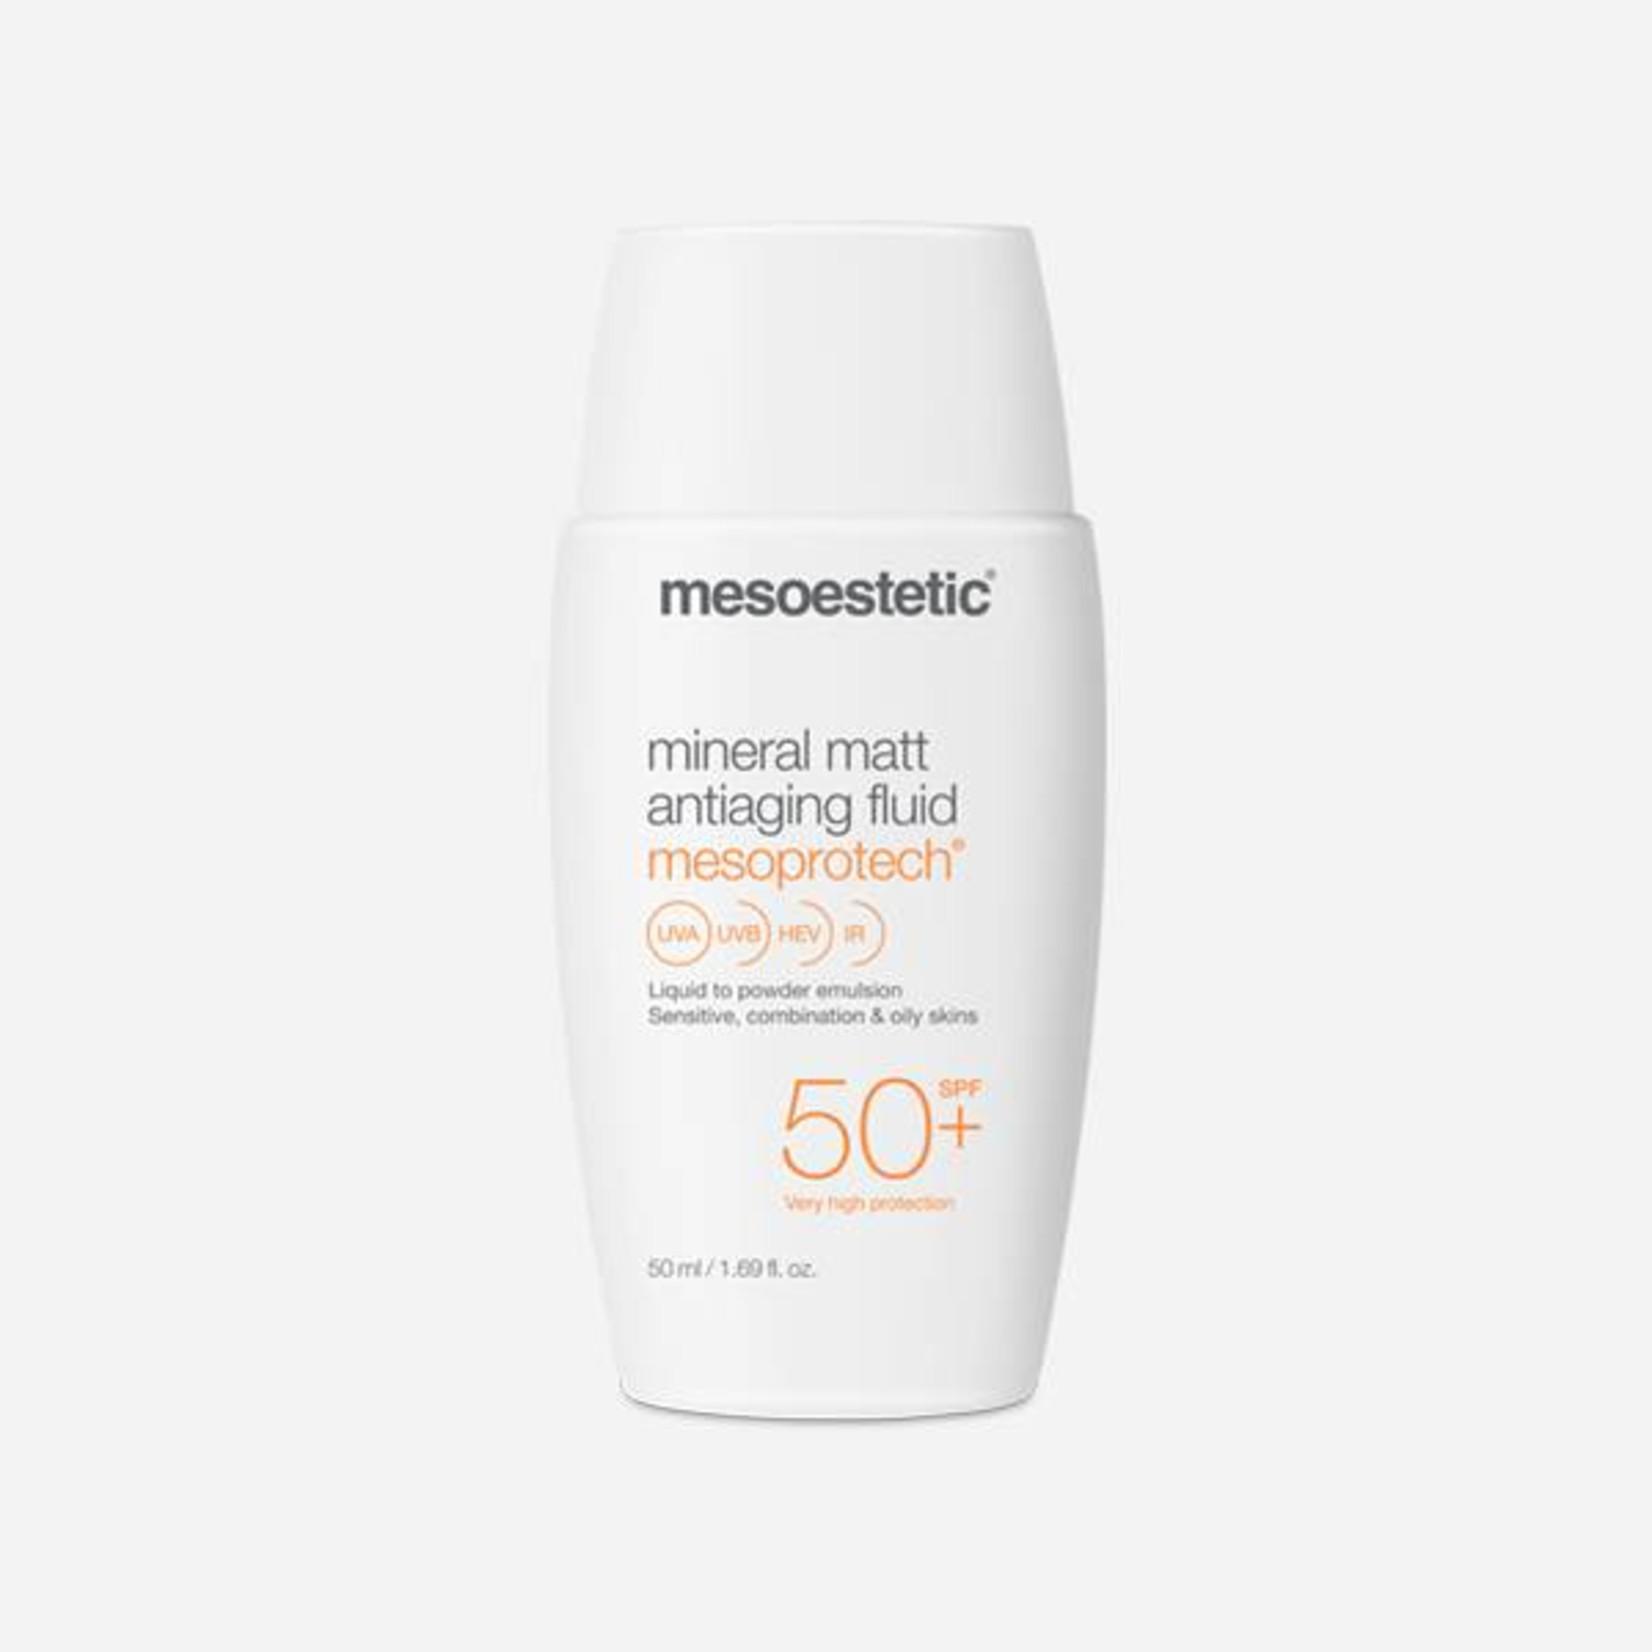 Mesoestetic Mineral matt antiaging fluid